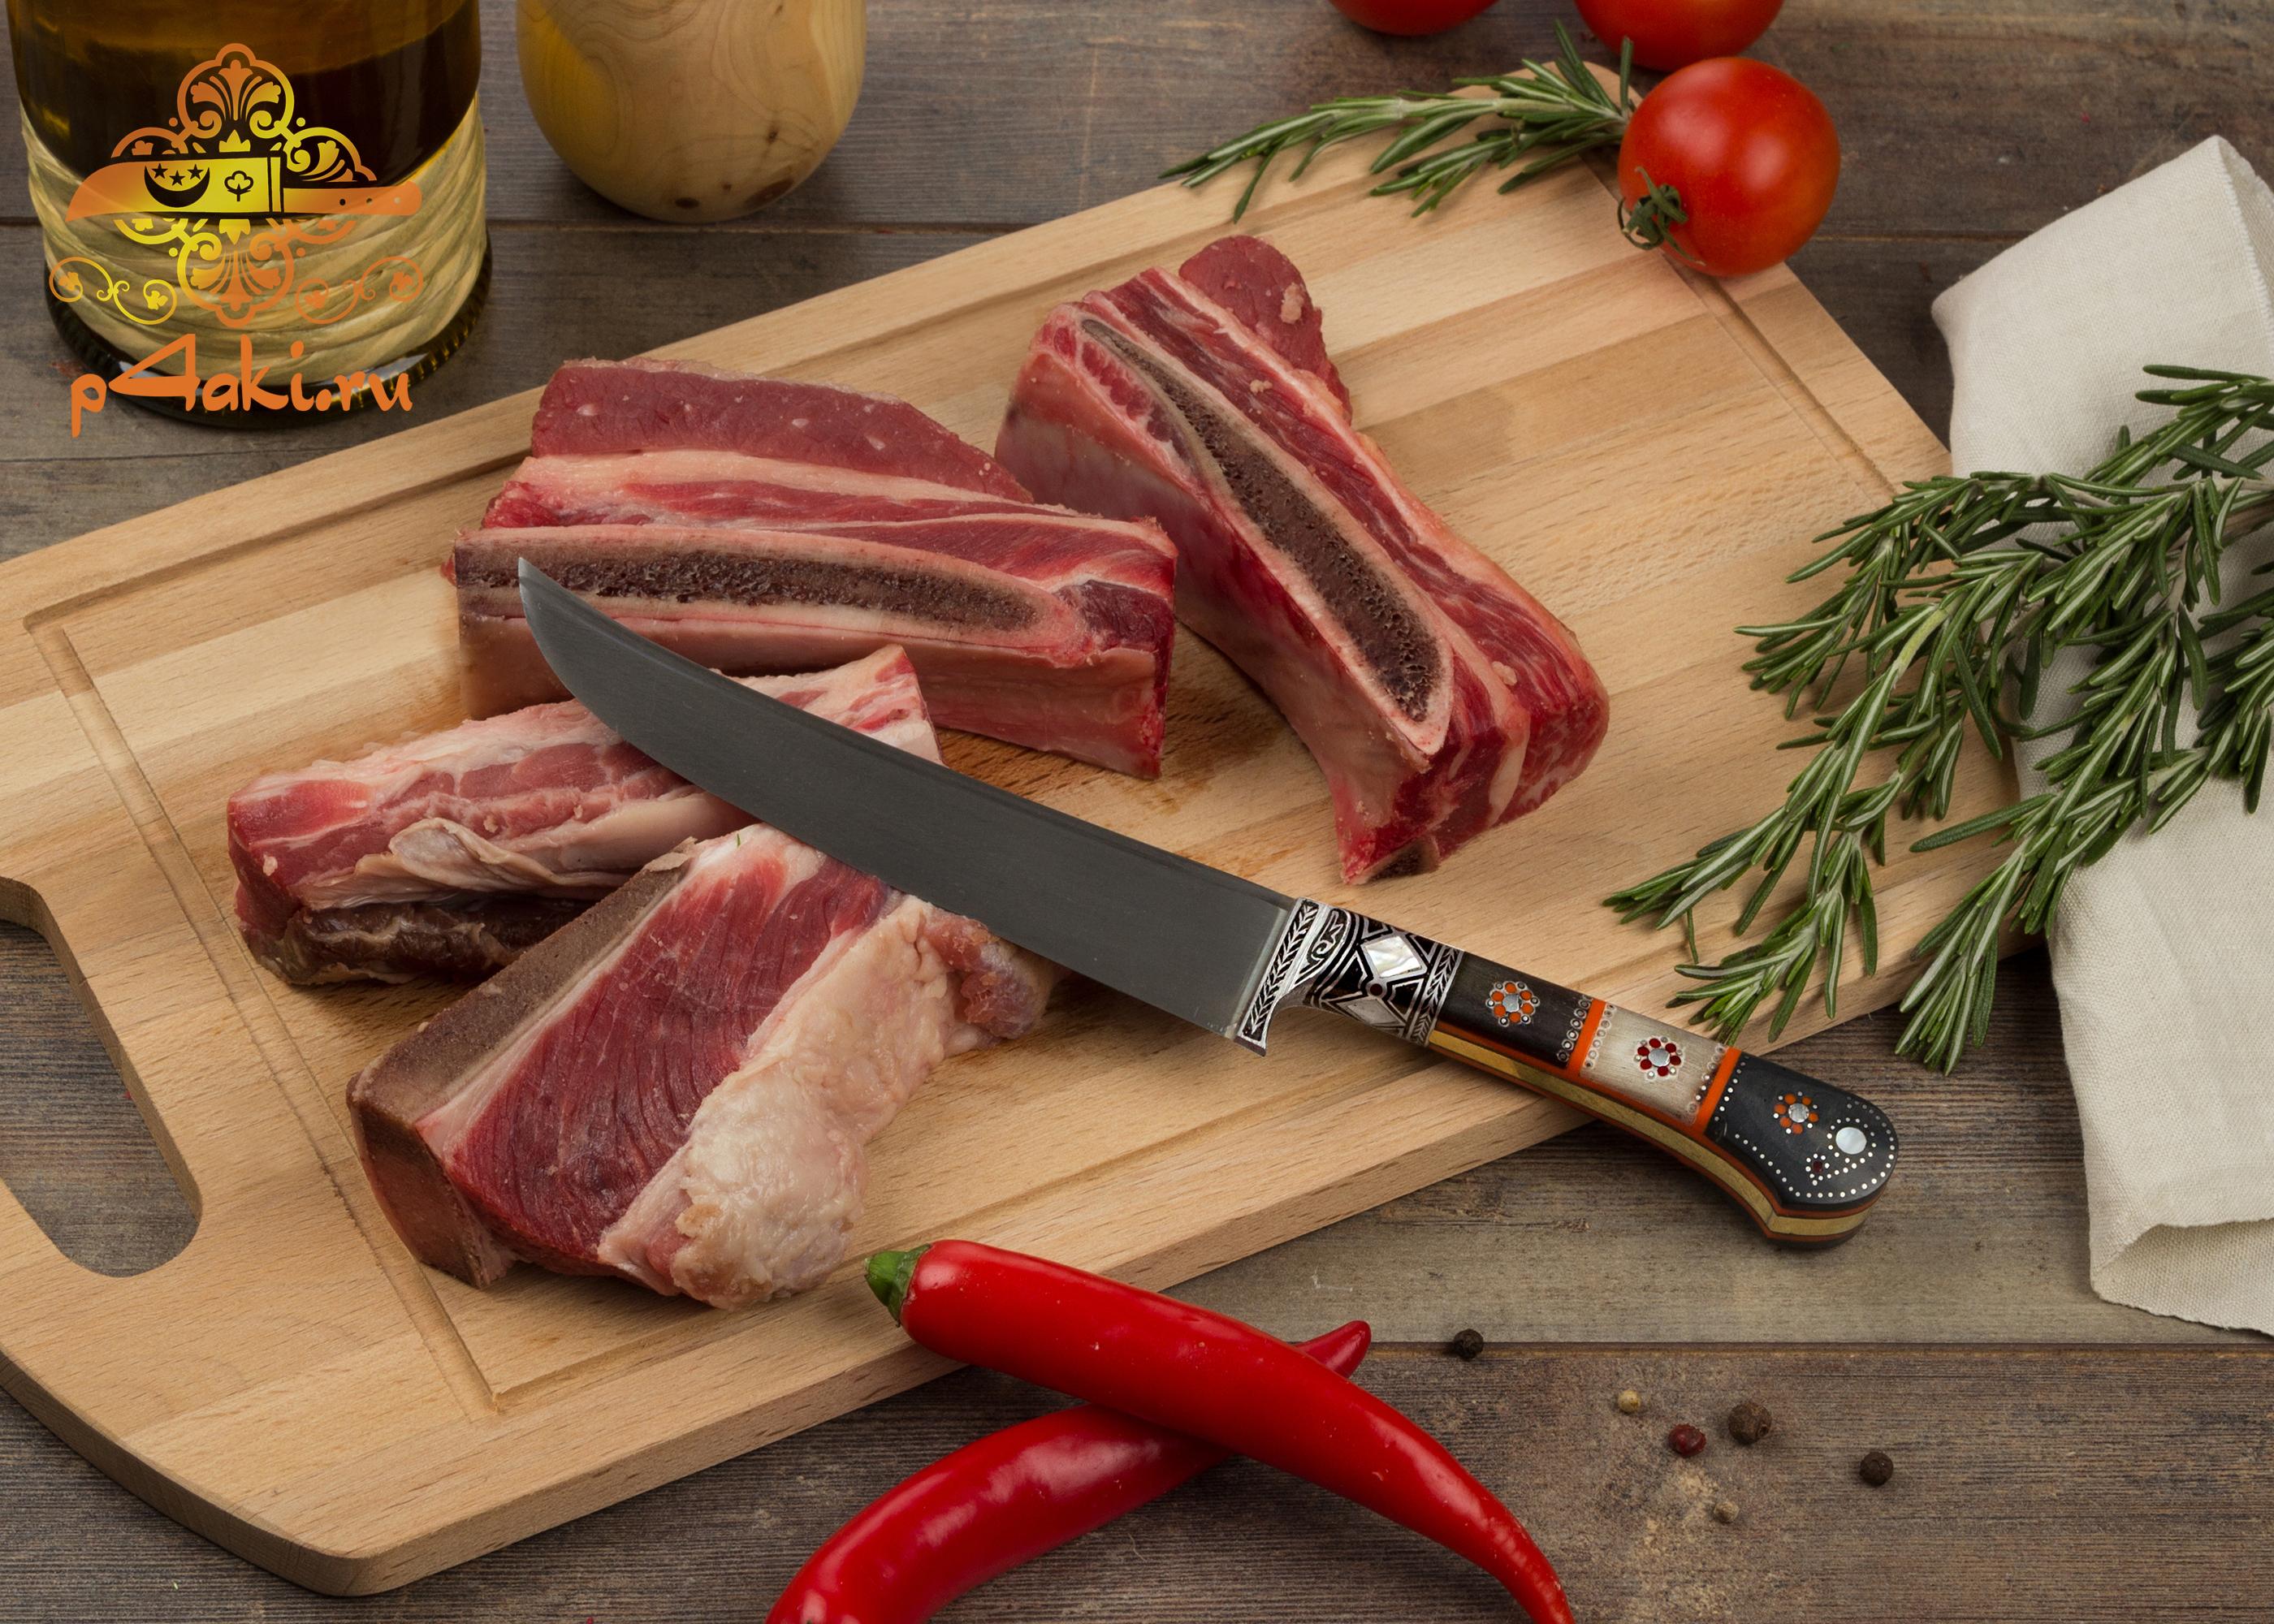 нож Рангли, (монтаж накладки «ерма даста» — рукоятка из рога архара.) со вставками перламутра (садаф) и чермяхи, «гюльбанд» и «бринч» — олово, латунь